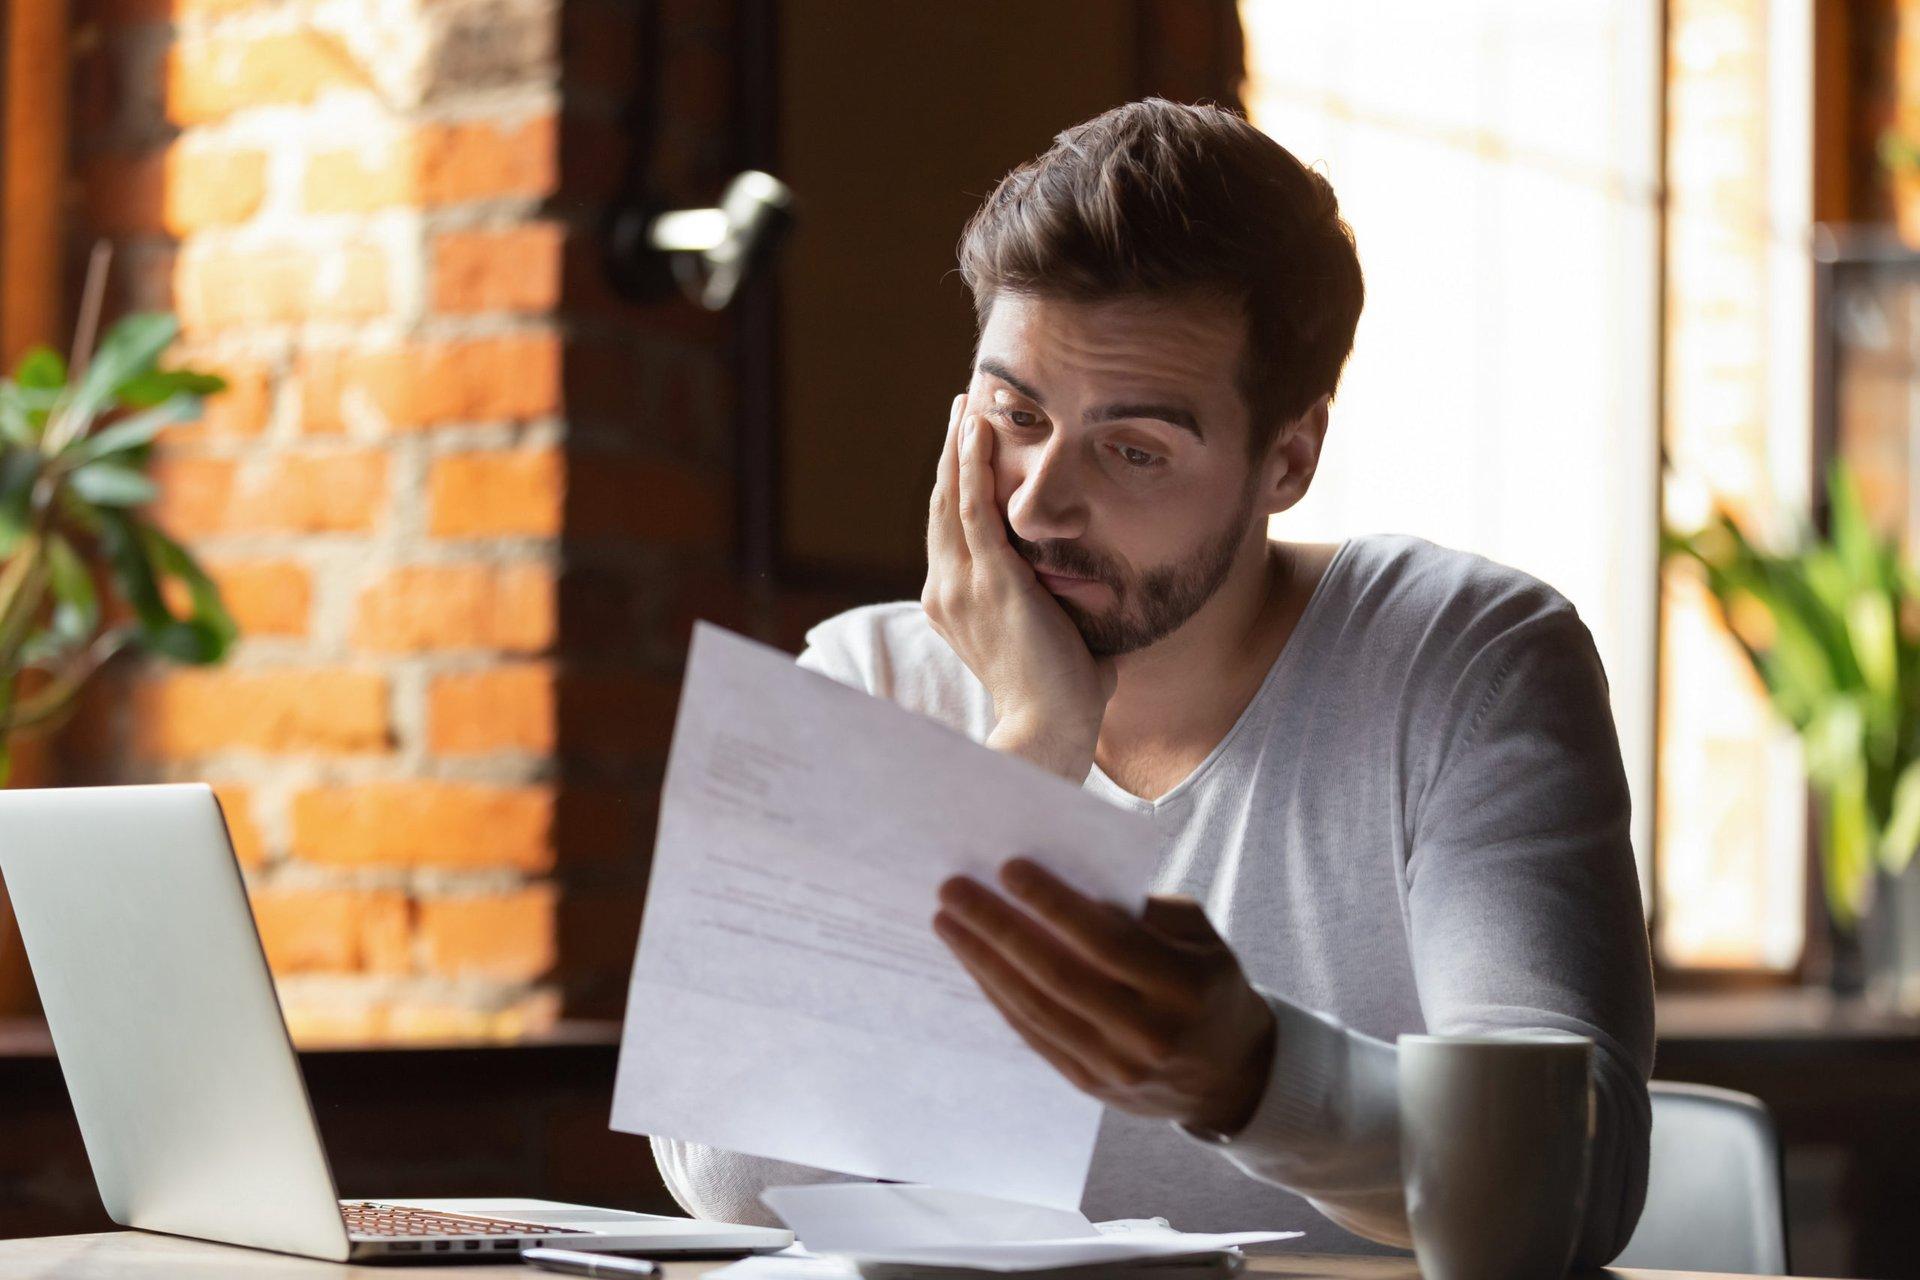 sad man reading his credit report